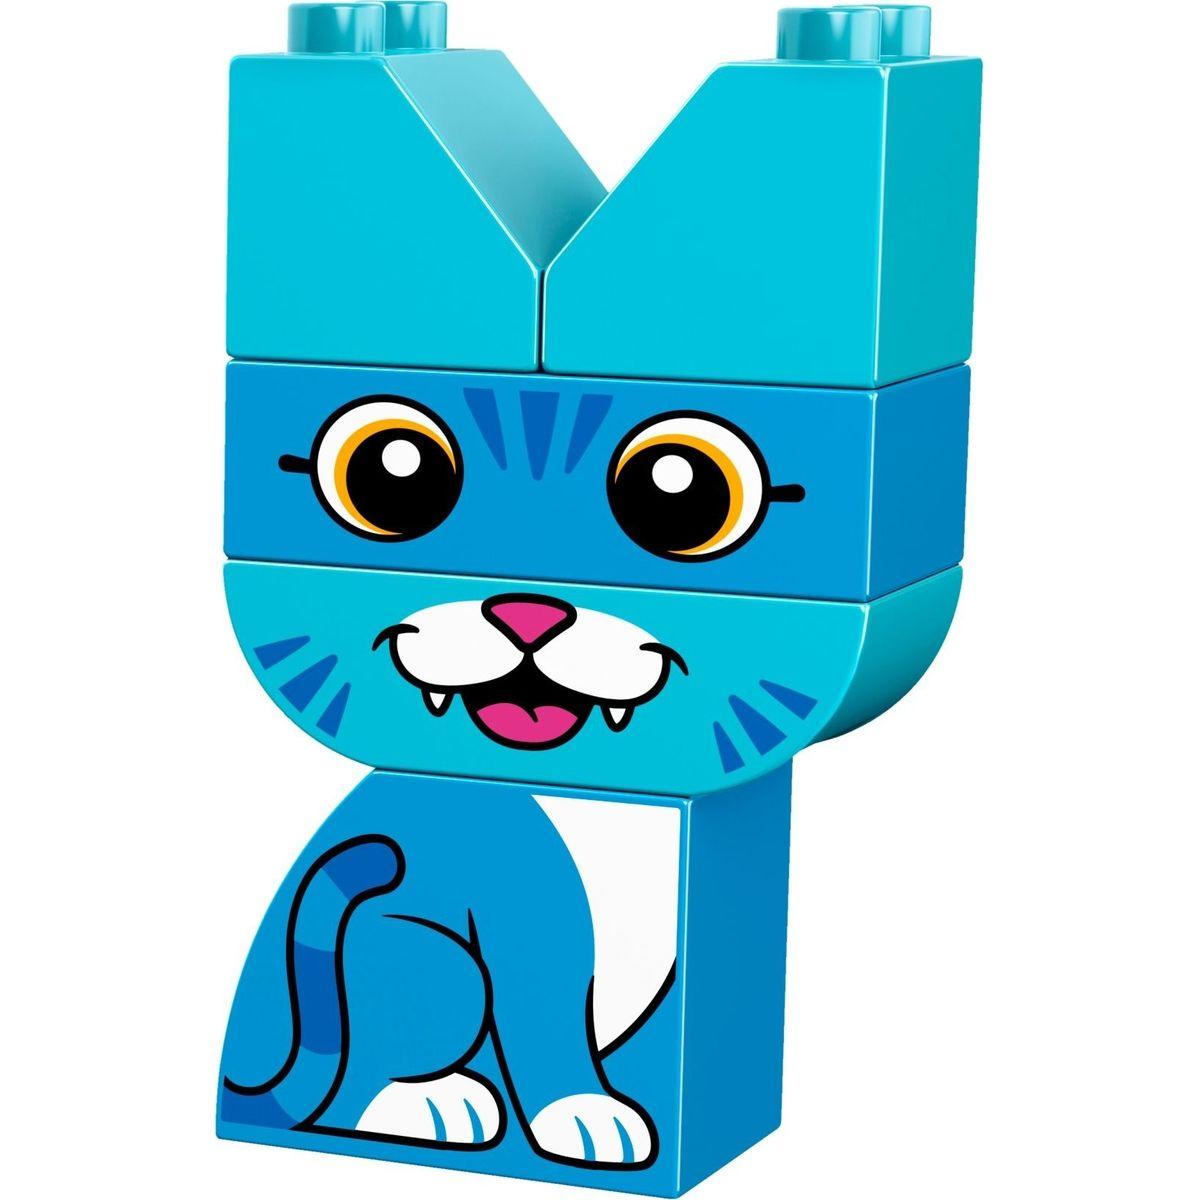 LEGO DUPLO 10858 Moji první skládací mazlíčci #7